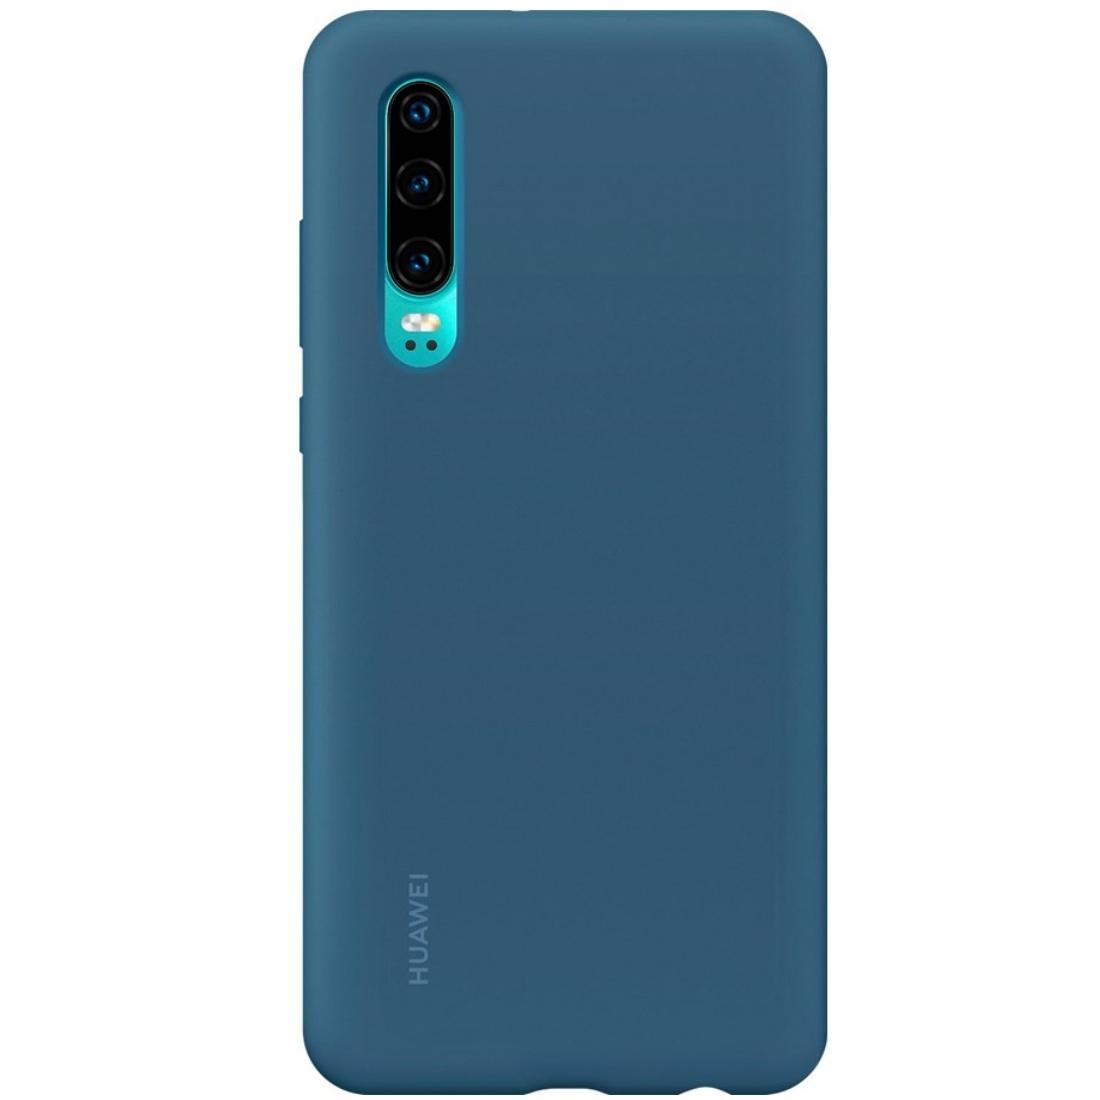 Capac protectie spate Huawei Silicone Cover pentru Huawei P30 Blue